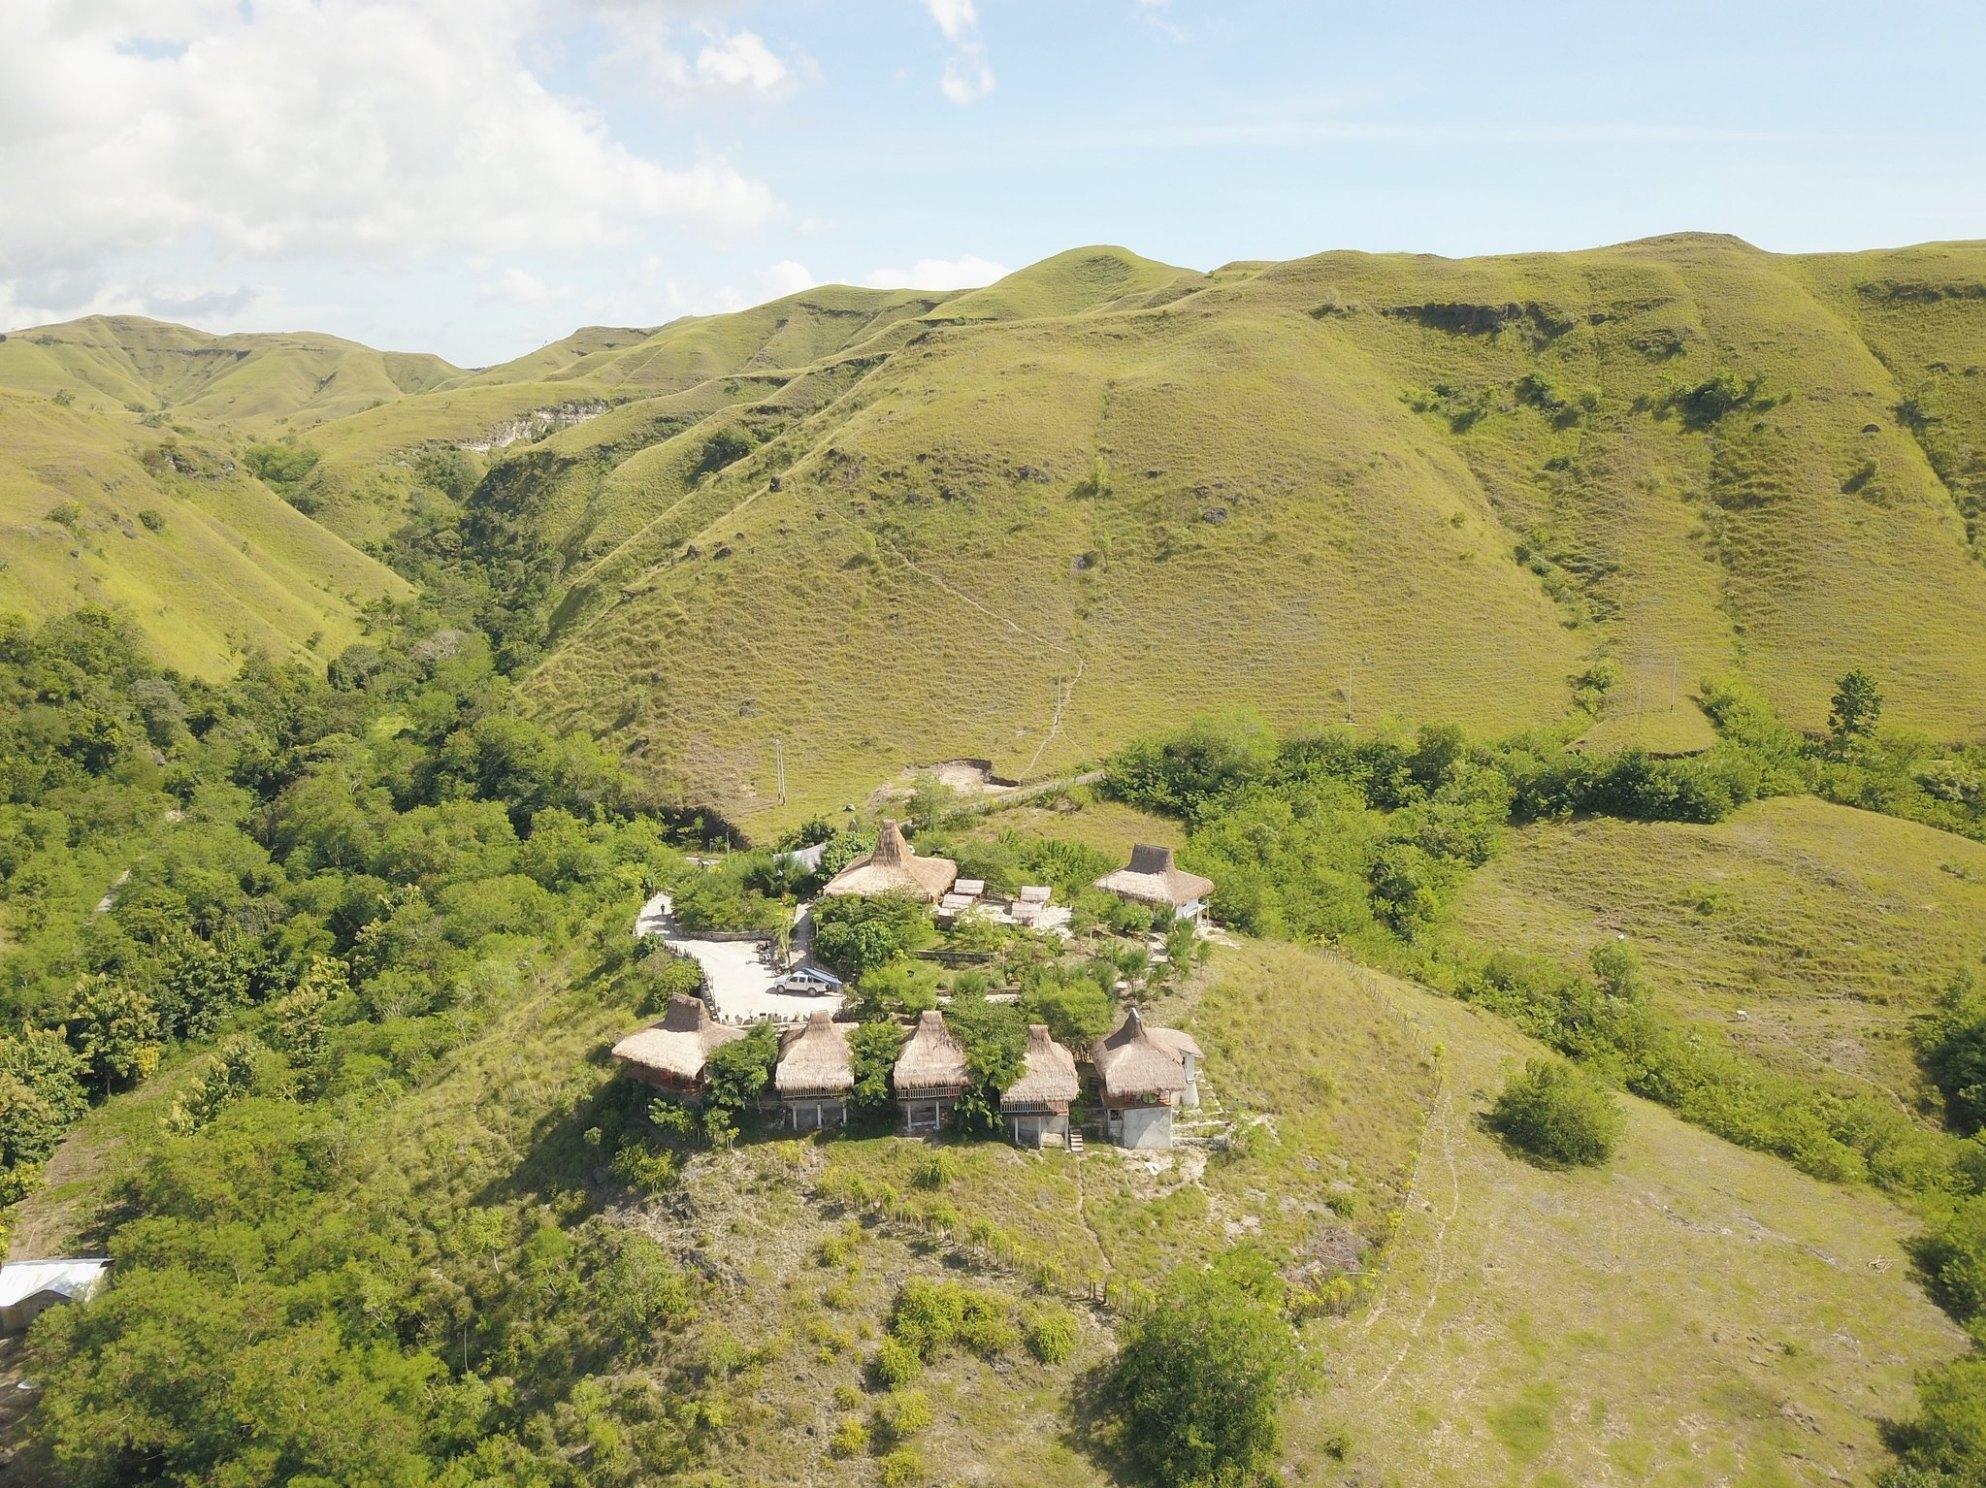 Morinda villa